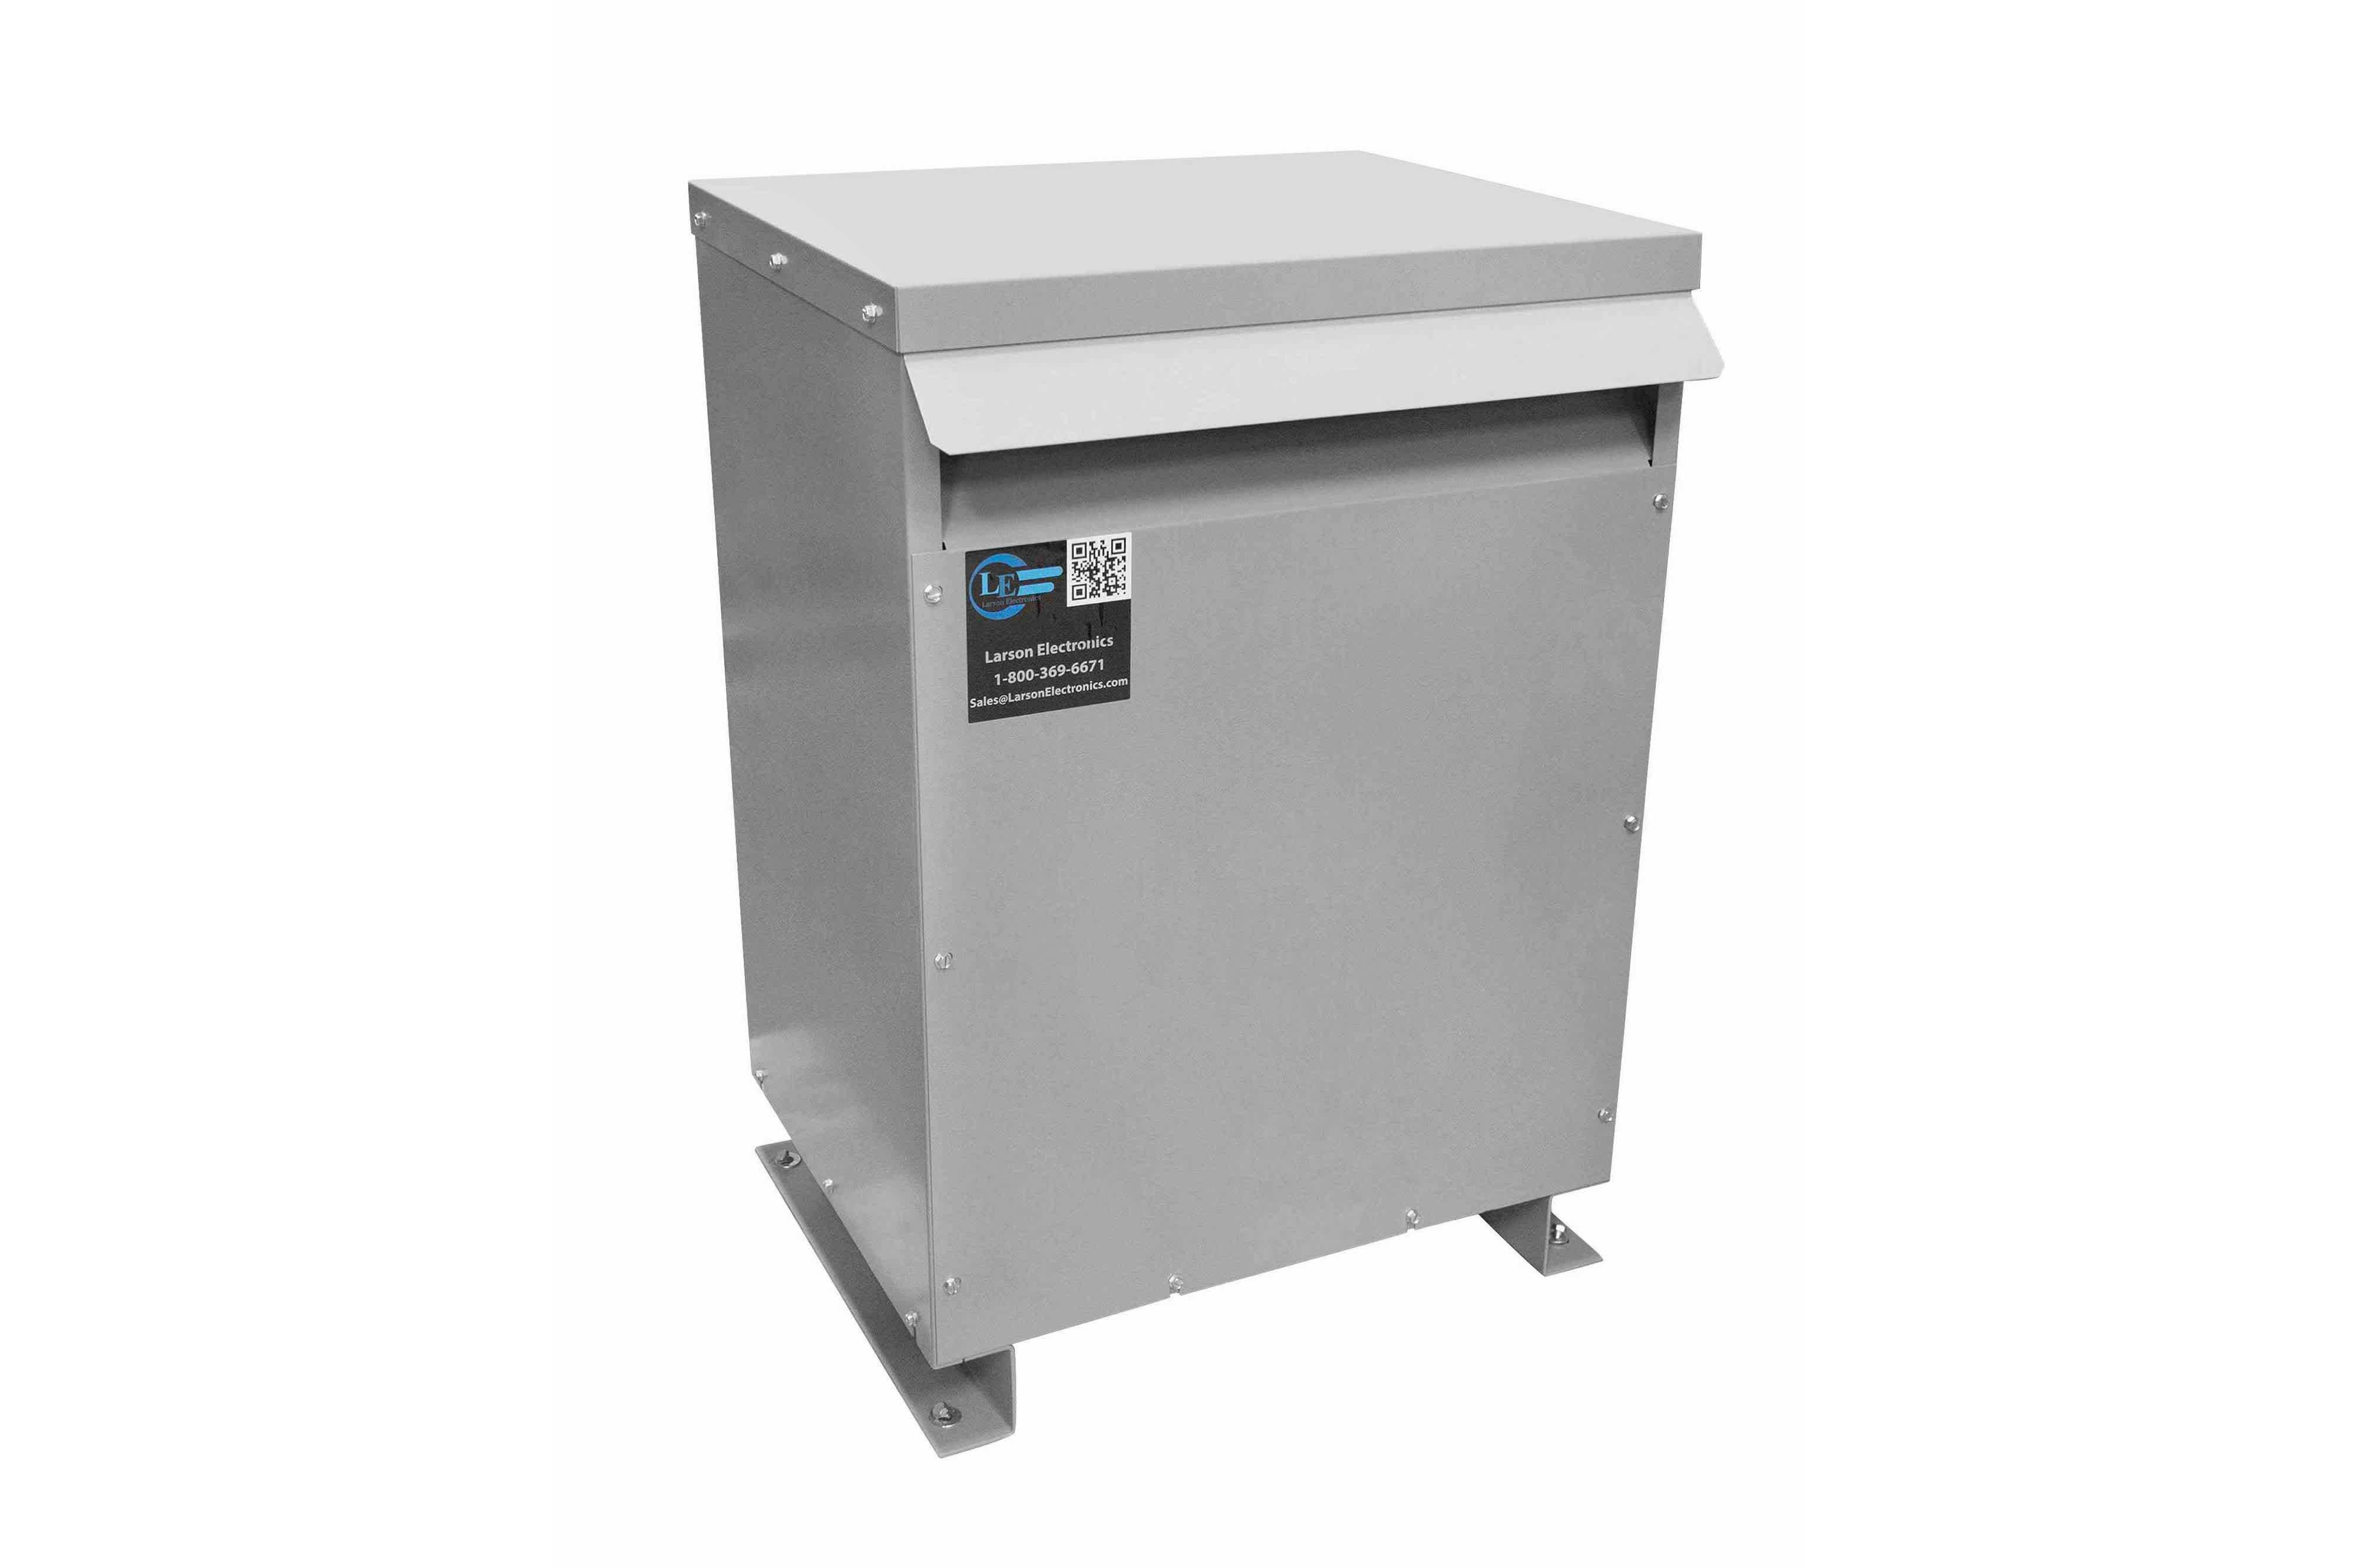 35 kVA 3PH Isolation Transformer, 480V Wye Primary, 480Y/277 Wye-N Secondary, N3R, Ventilated, 60 Hz